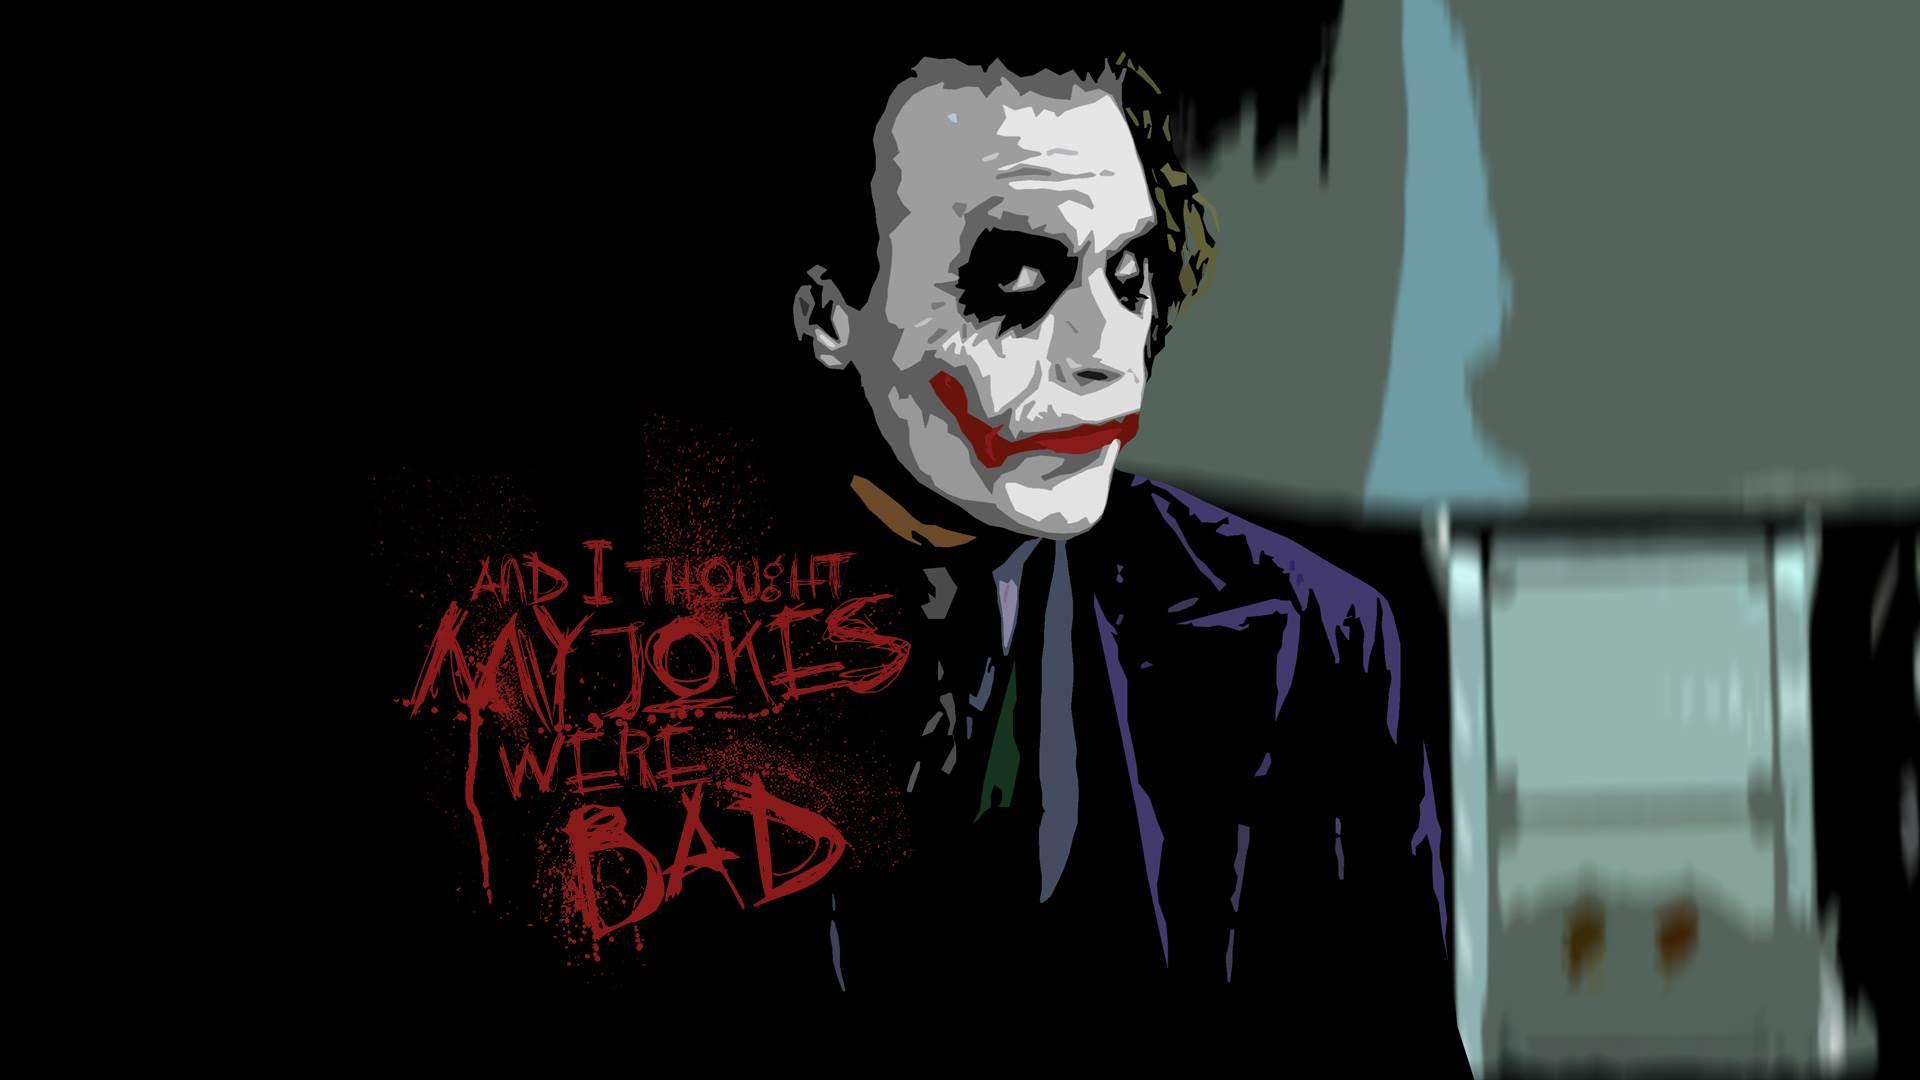 The Joker Wallpapers 1920x1080